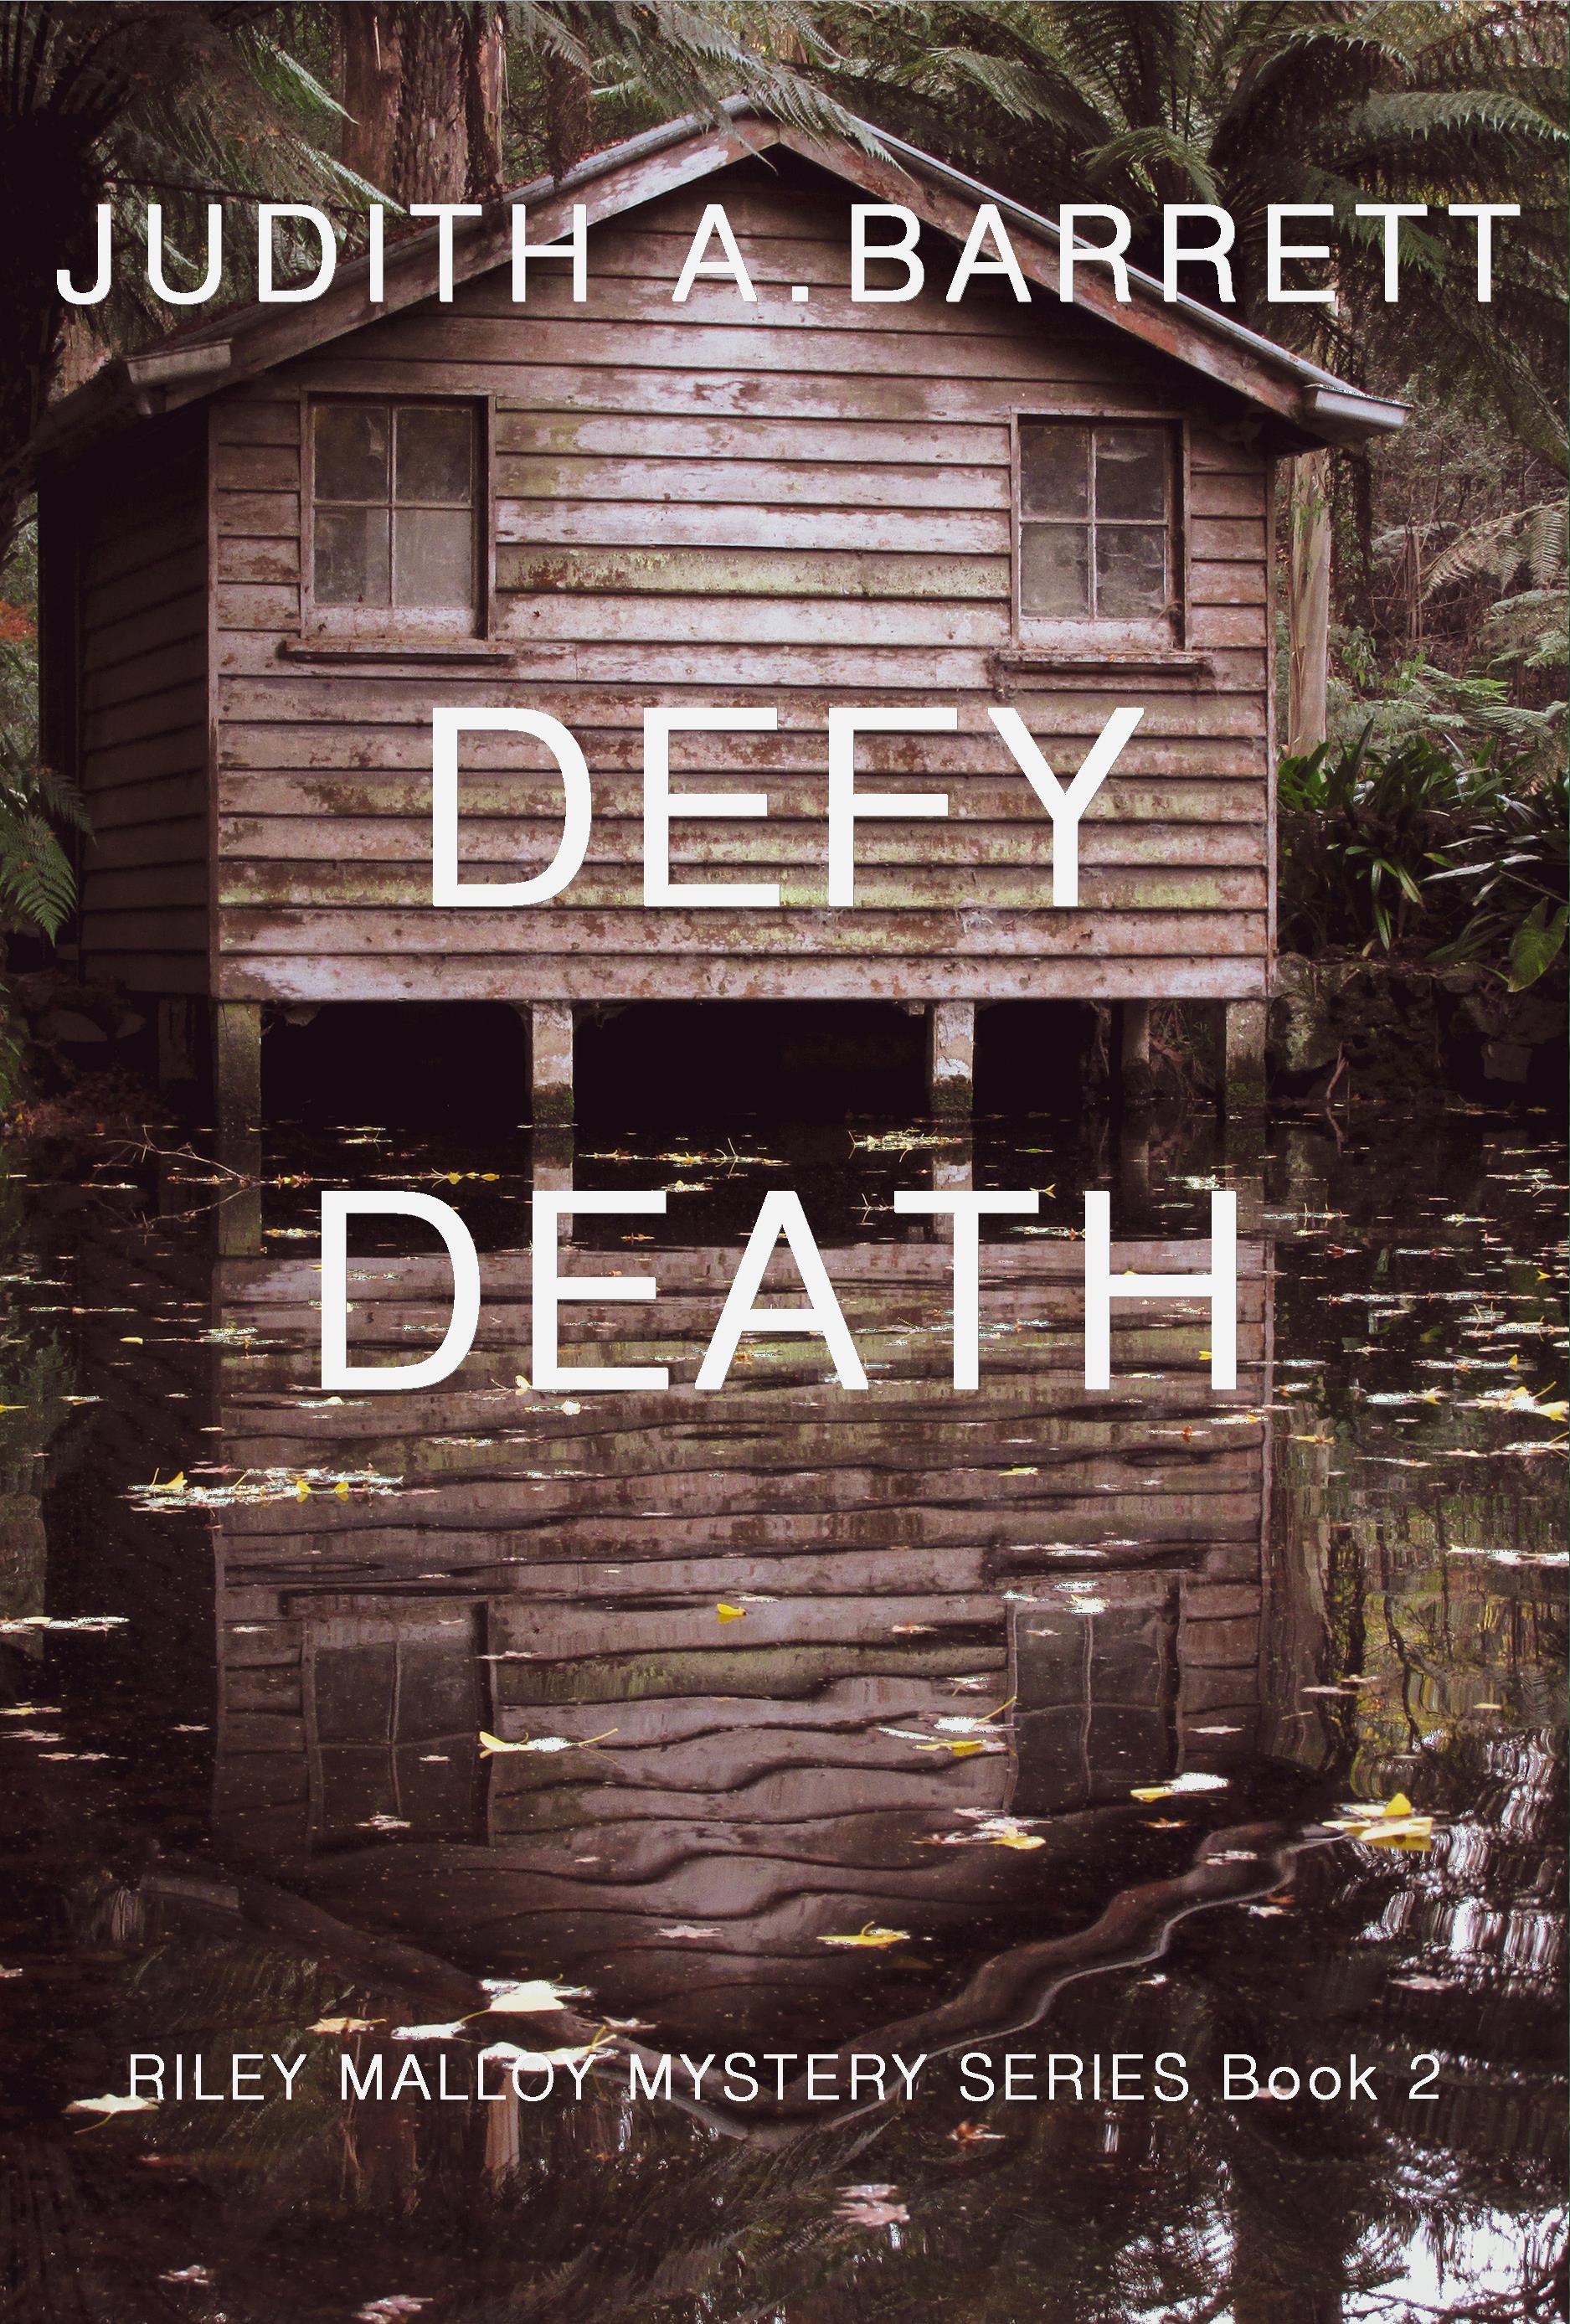 DEFY Cover Book 2 Jan 31 2021 ebook